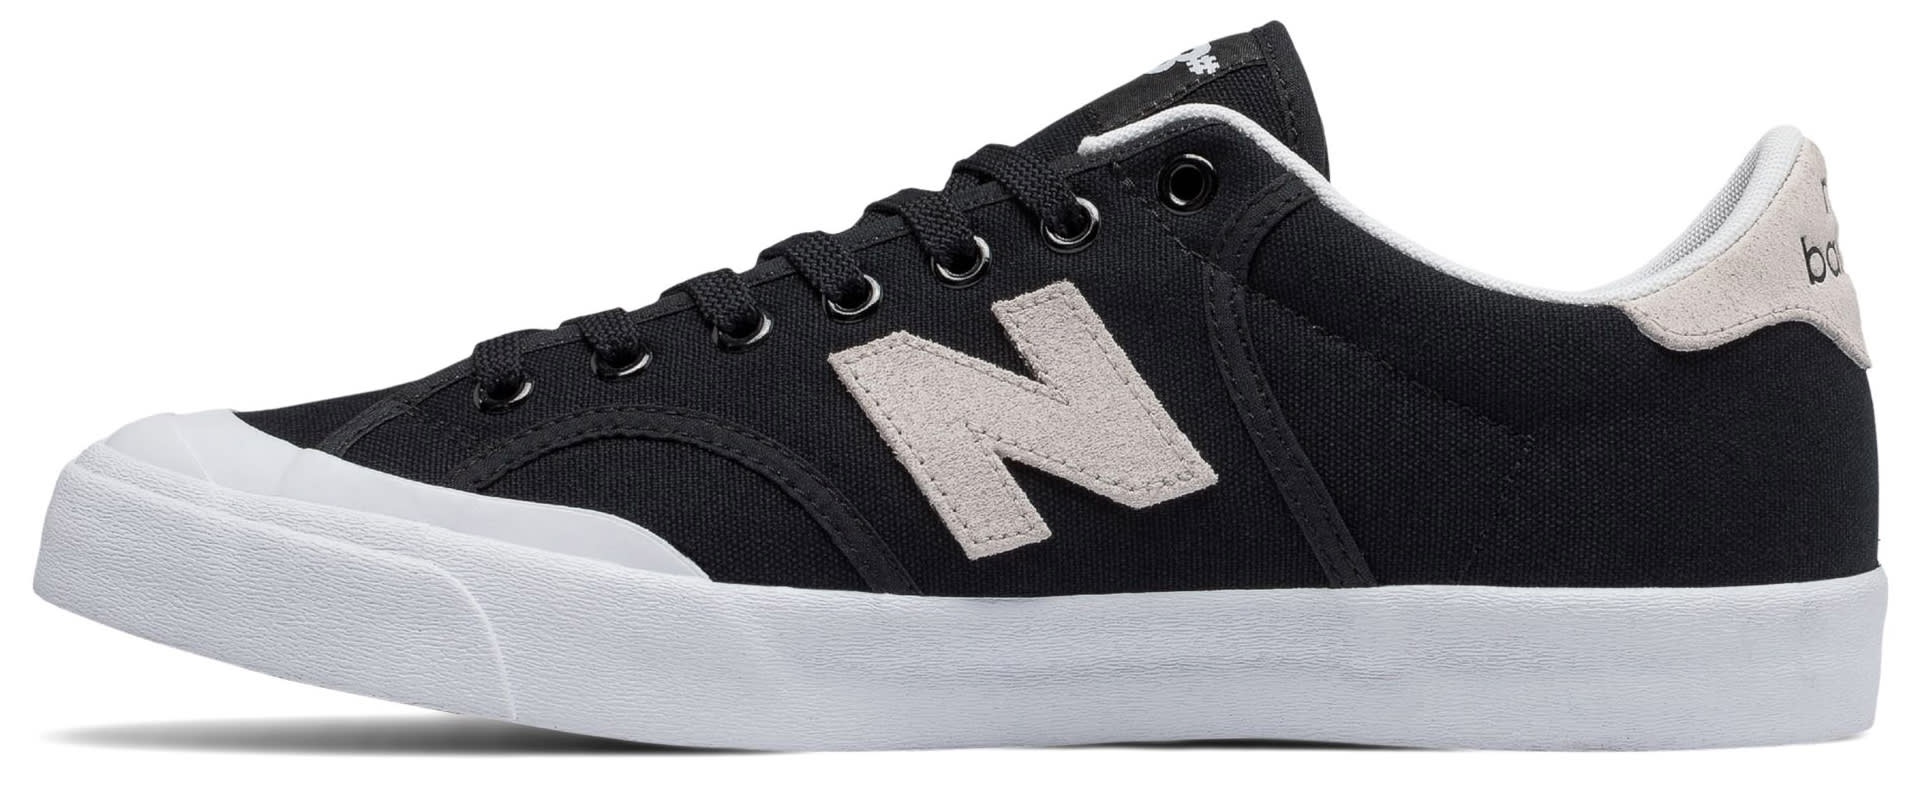 new balance pro court 212